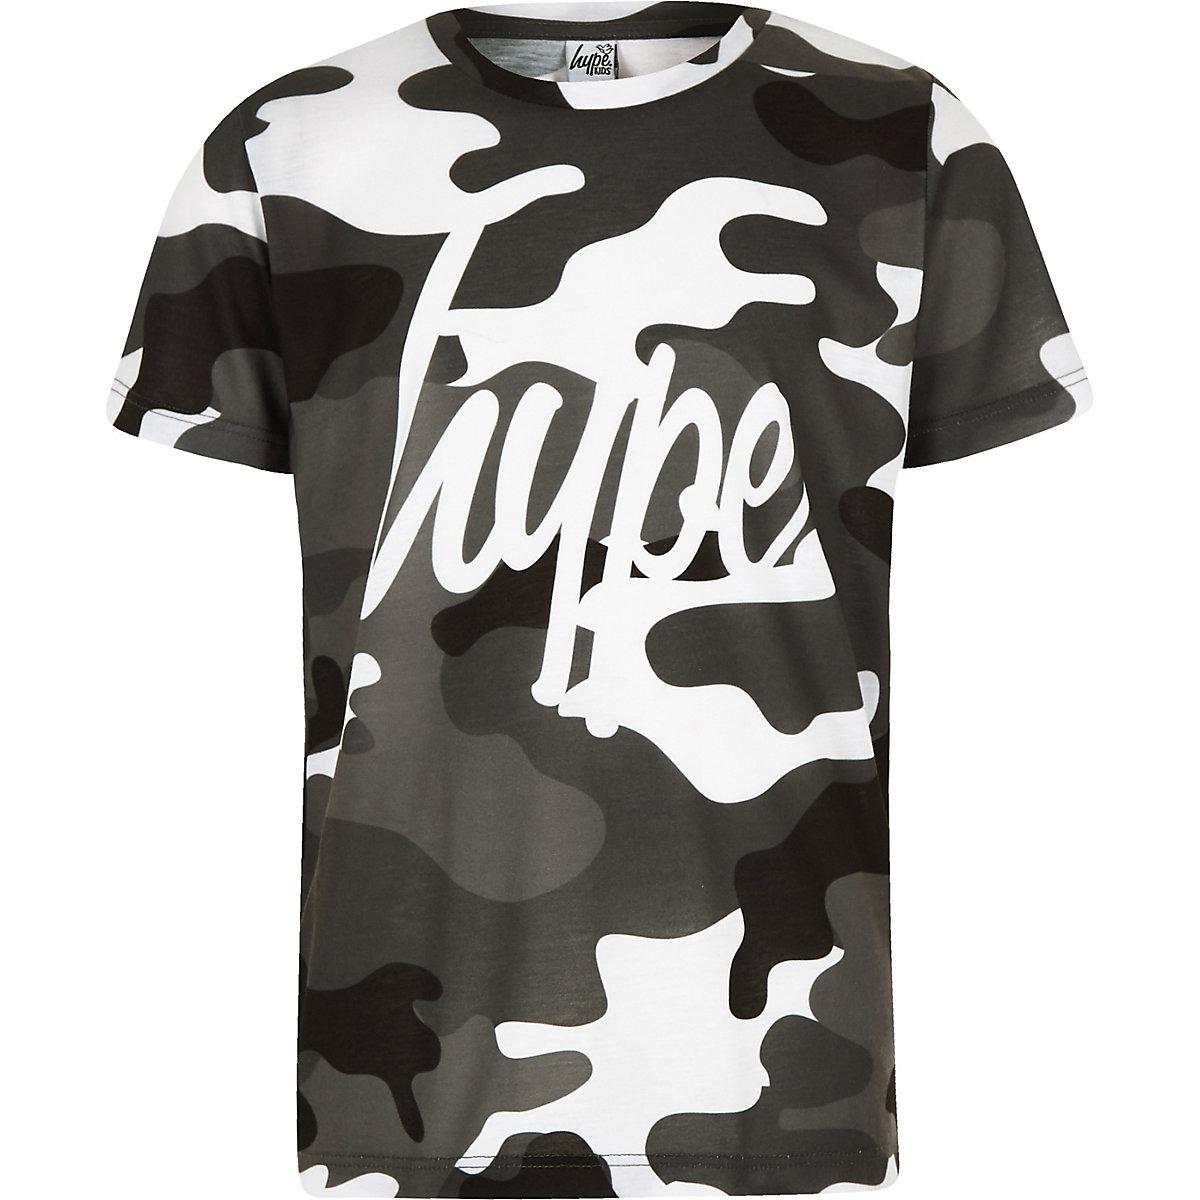 9e38d3c242 Boys grey Hype camo T-shirt - T-shirts - T-Shirts   Vests - boys